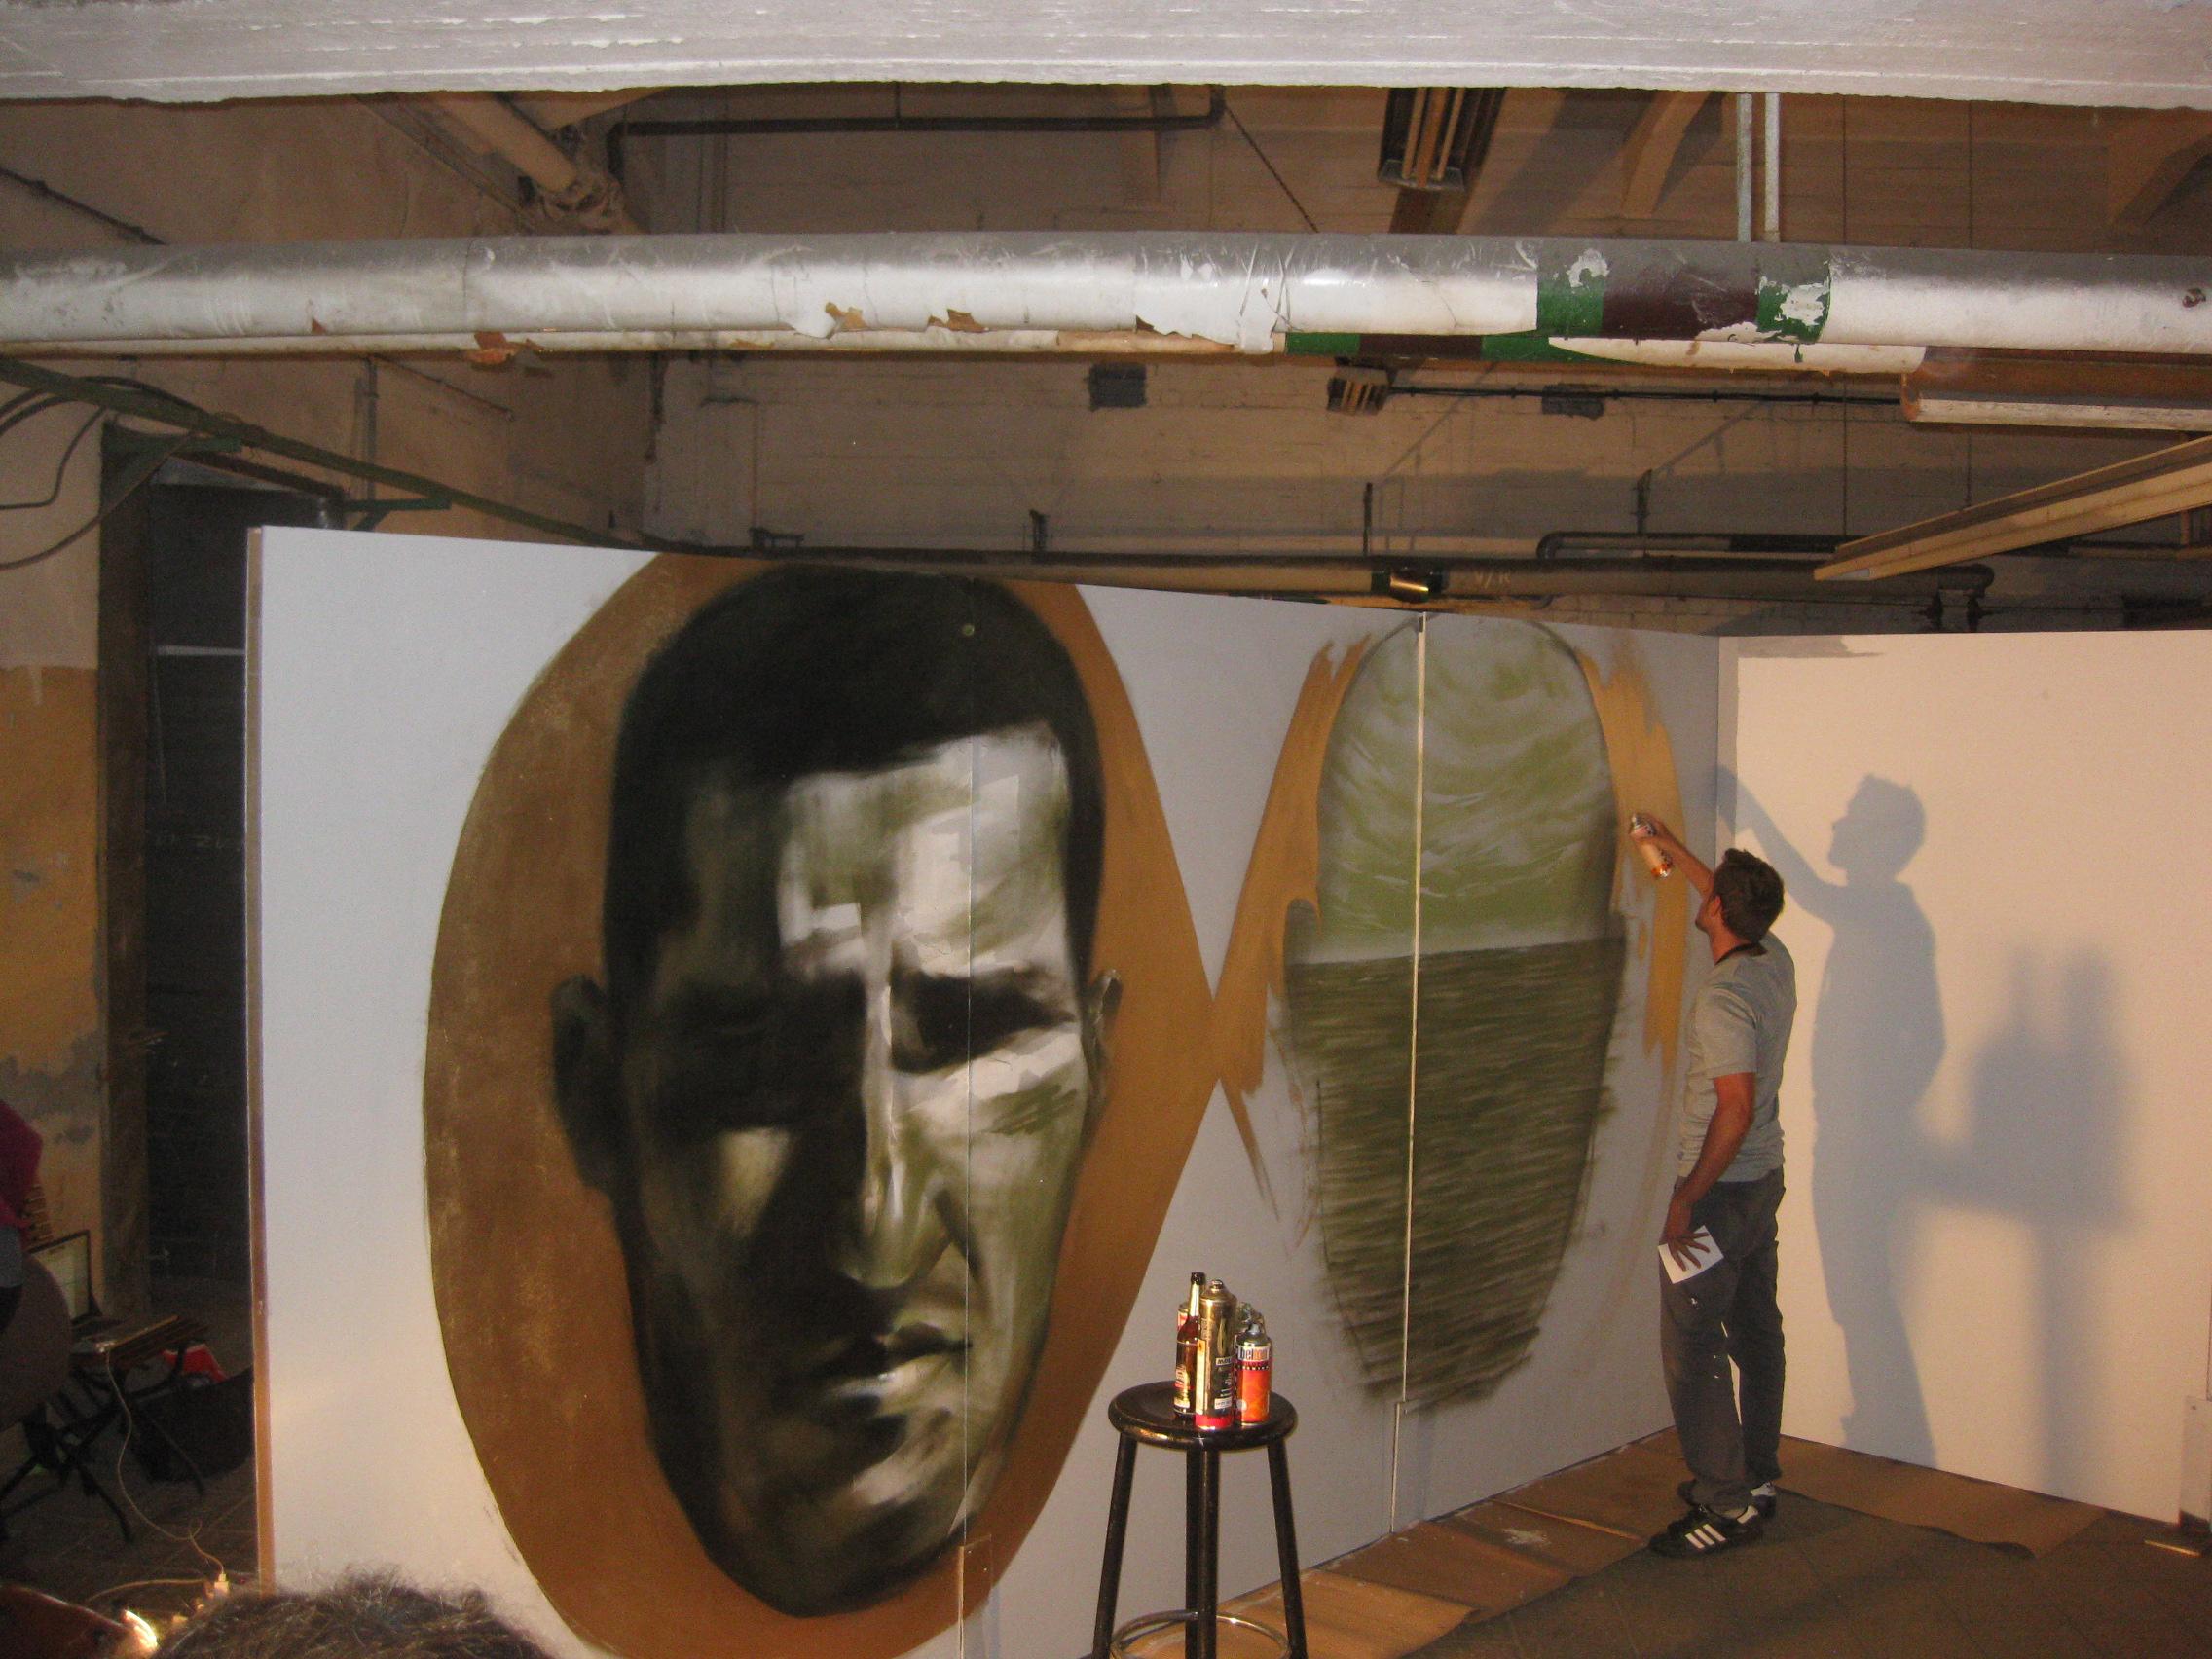 ART WEEK BERLIN 2012 STROKE URBAN ART FAIR